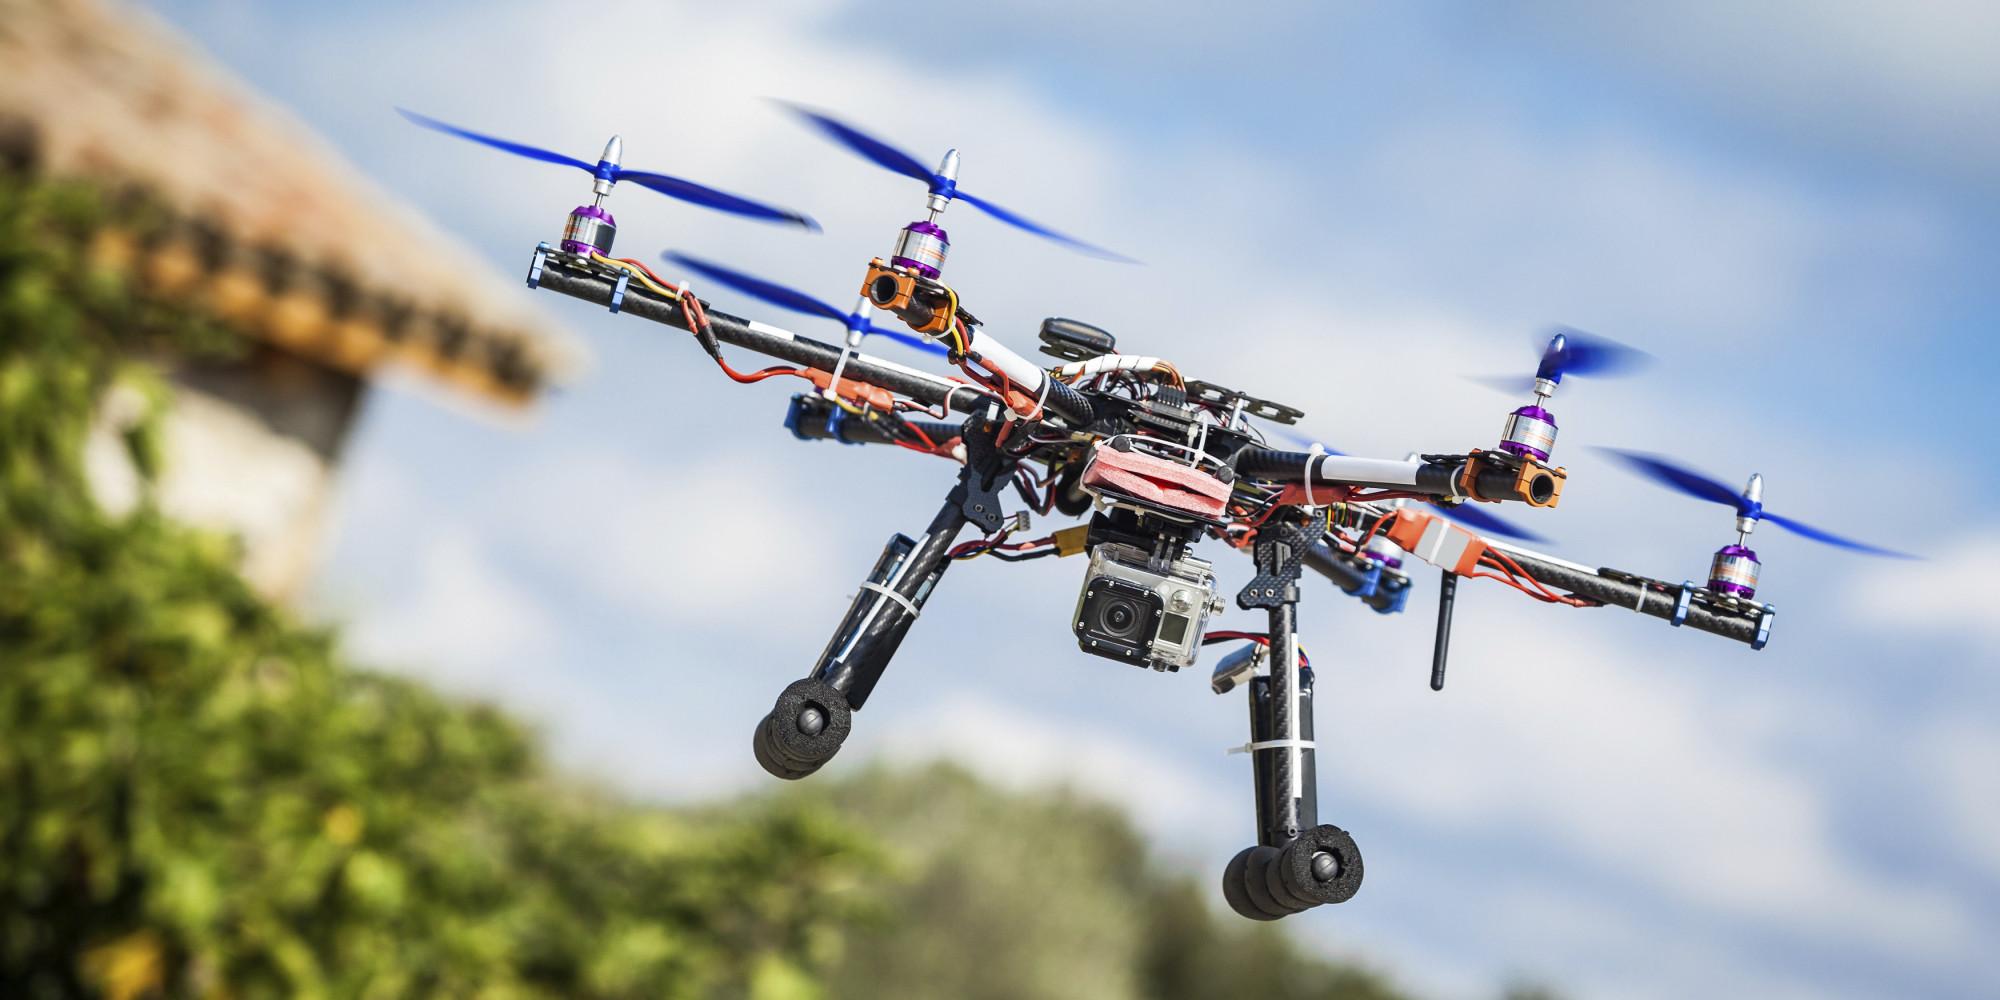 drone_flying_image.jpg